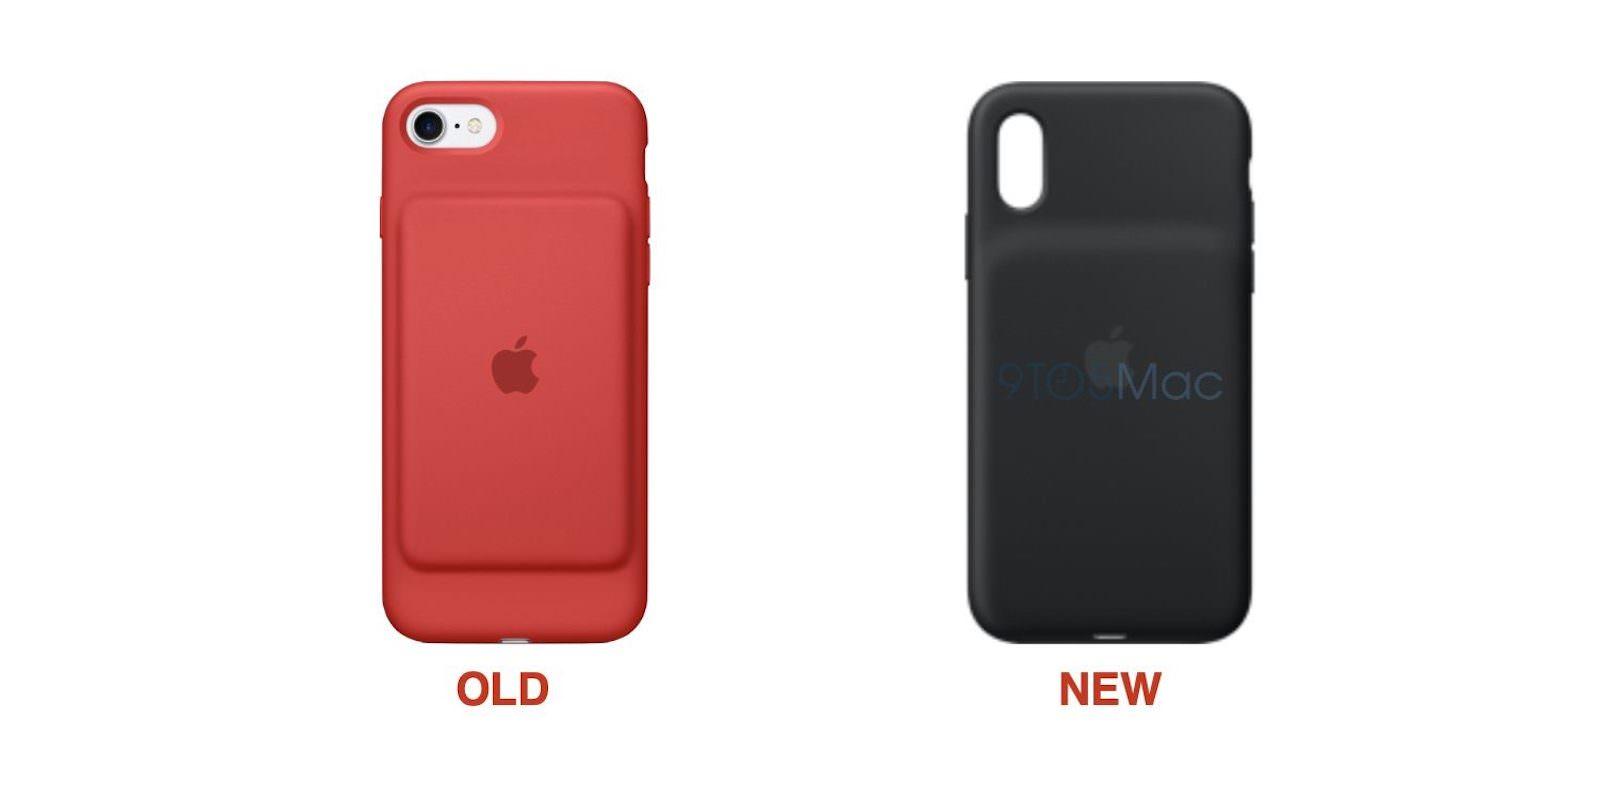 Iphone x smart battery case rambo1 9to5mac